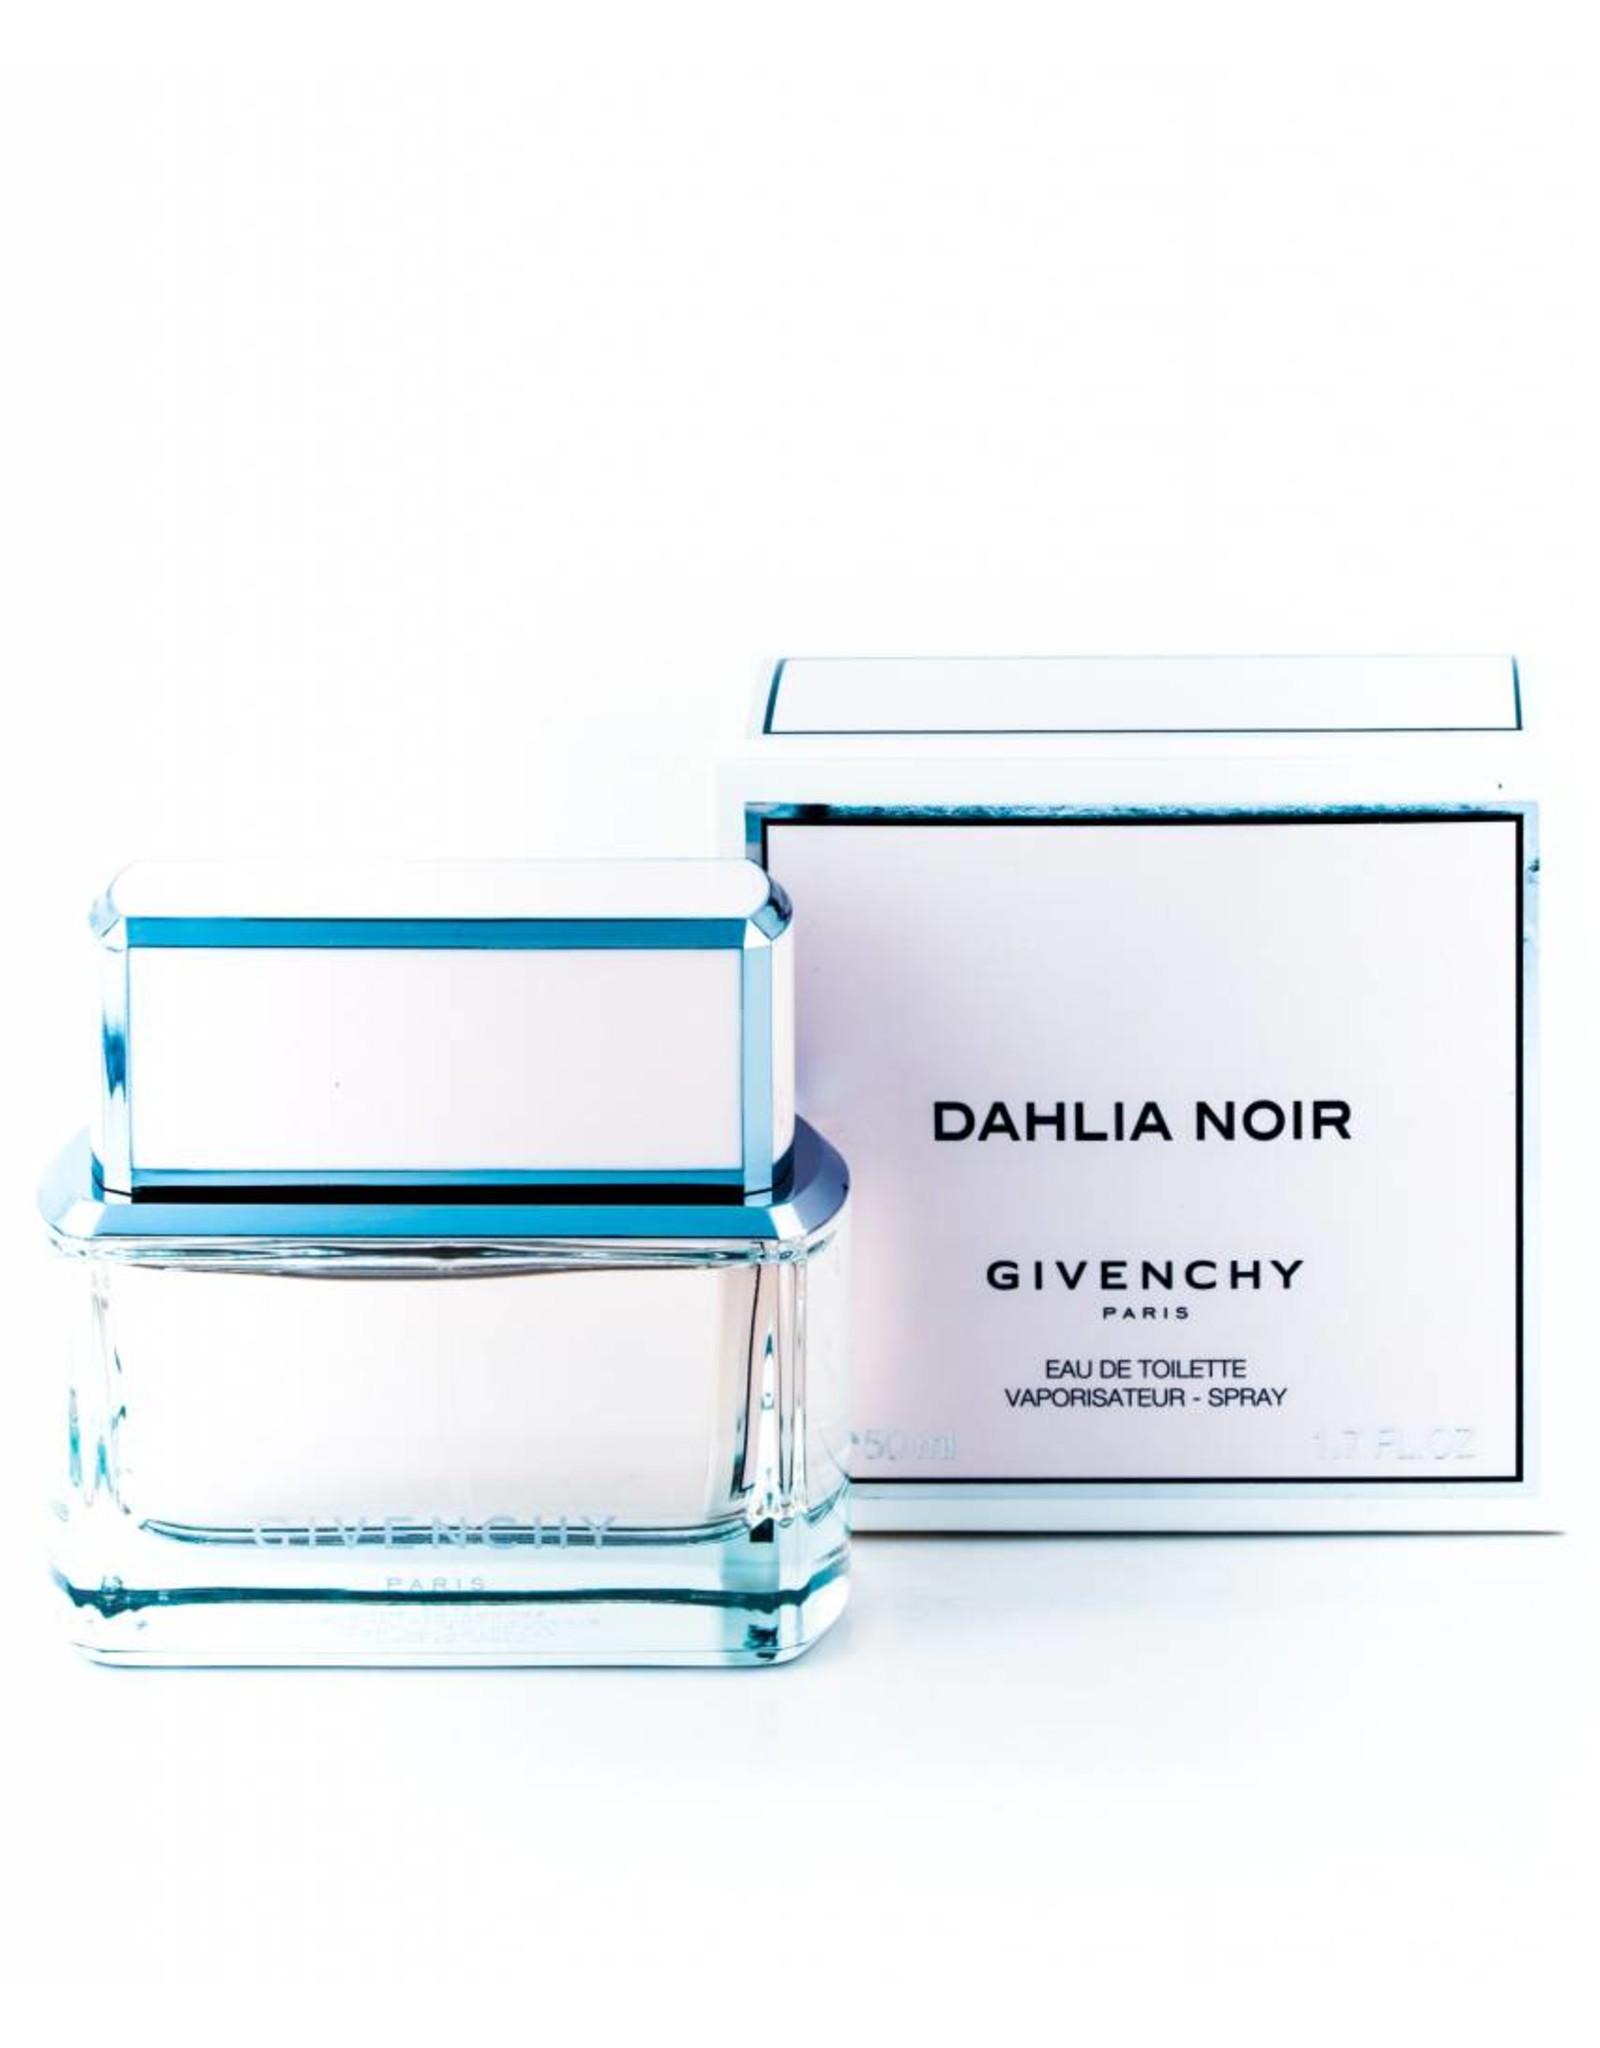 GIVENCHY GIVENCHY DAHLIA NOIR